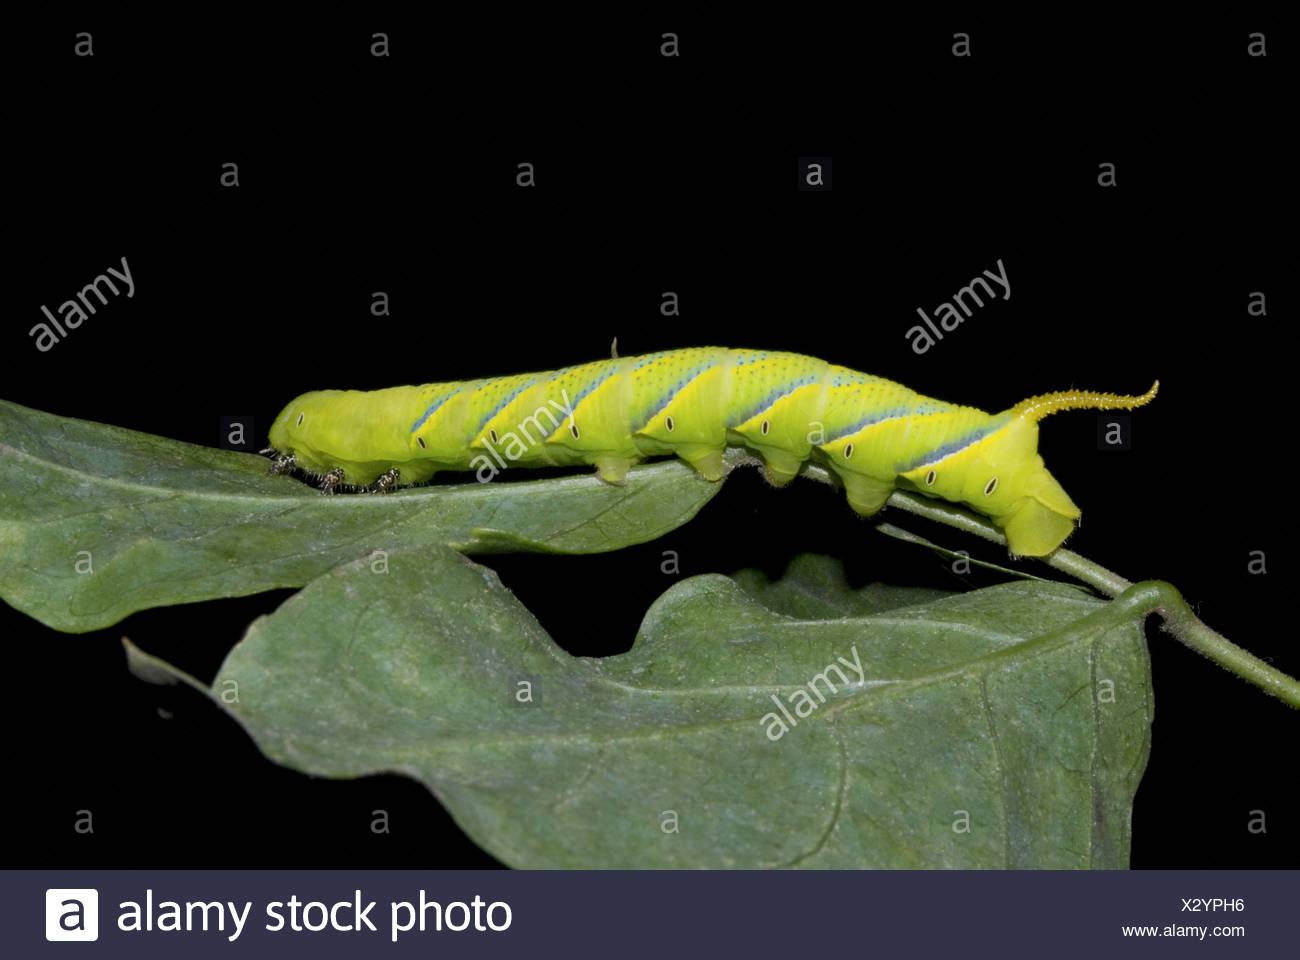 Caterpillar Sphinx Caroline Pune Photo Stock